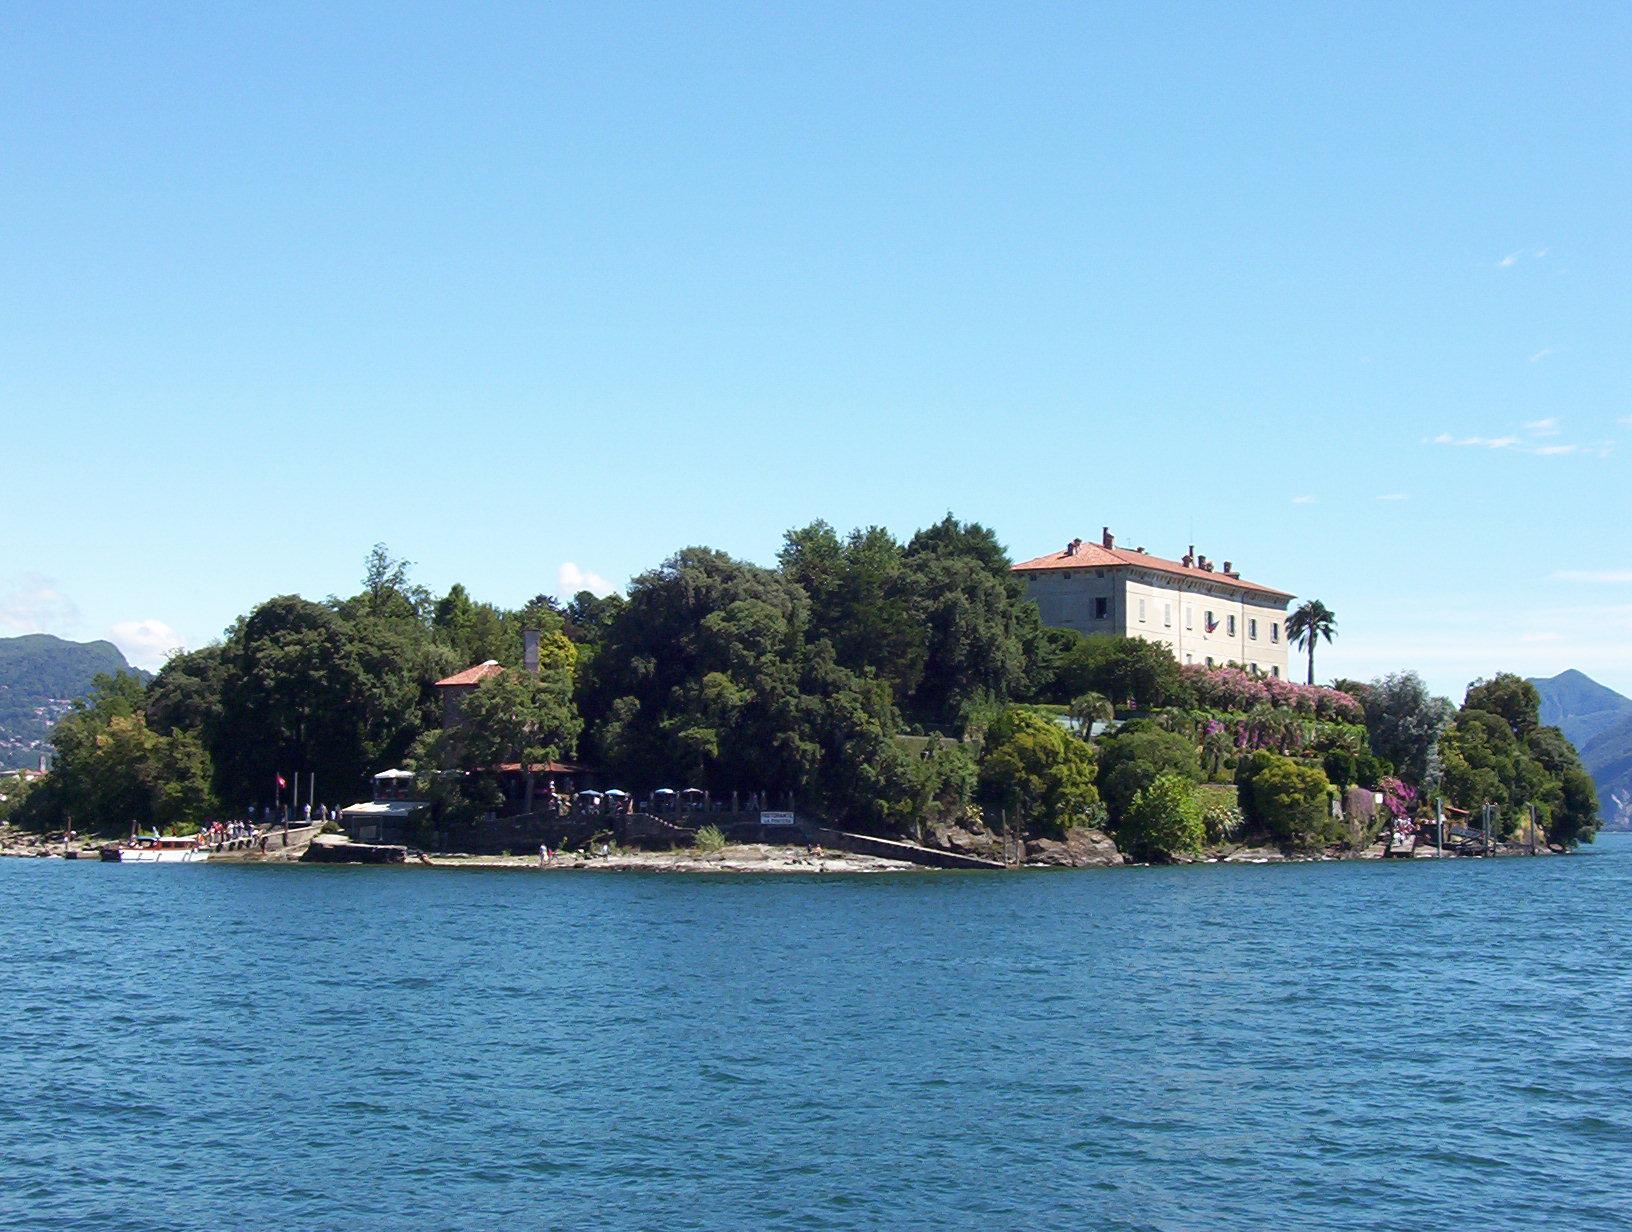 File:Isola Madre.jpg